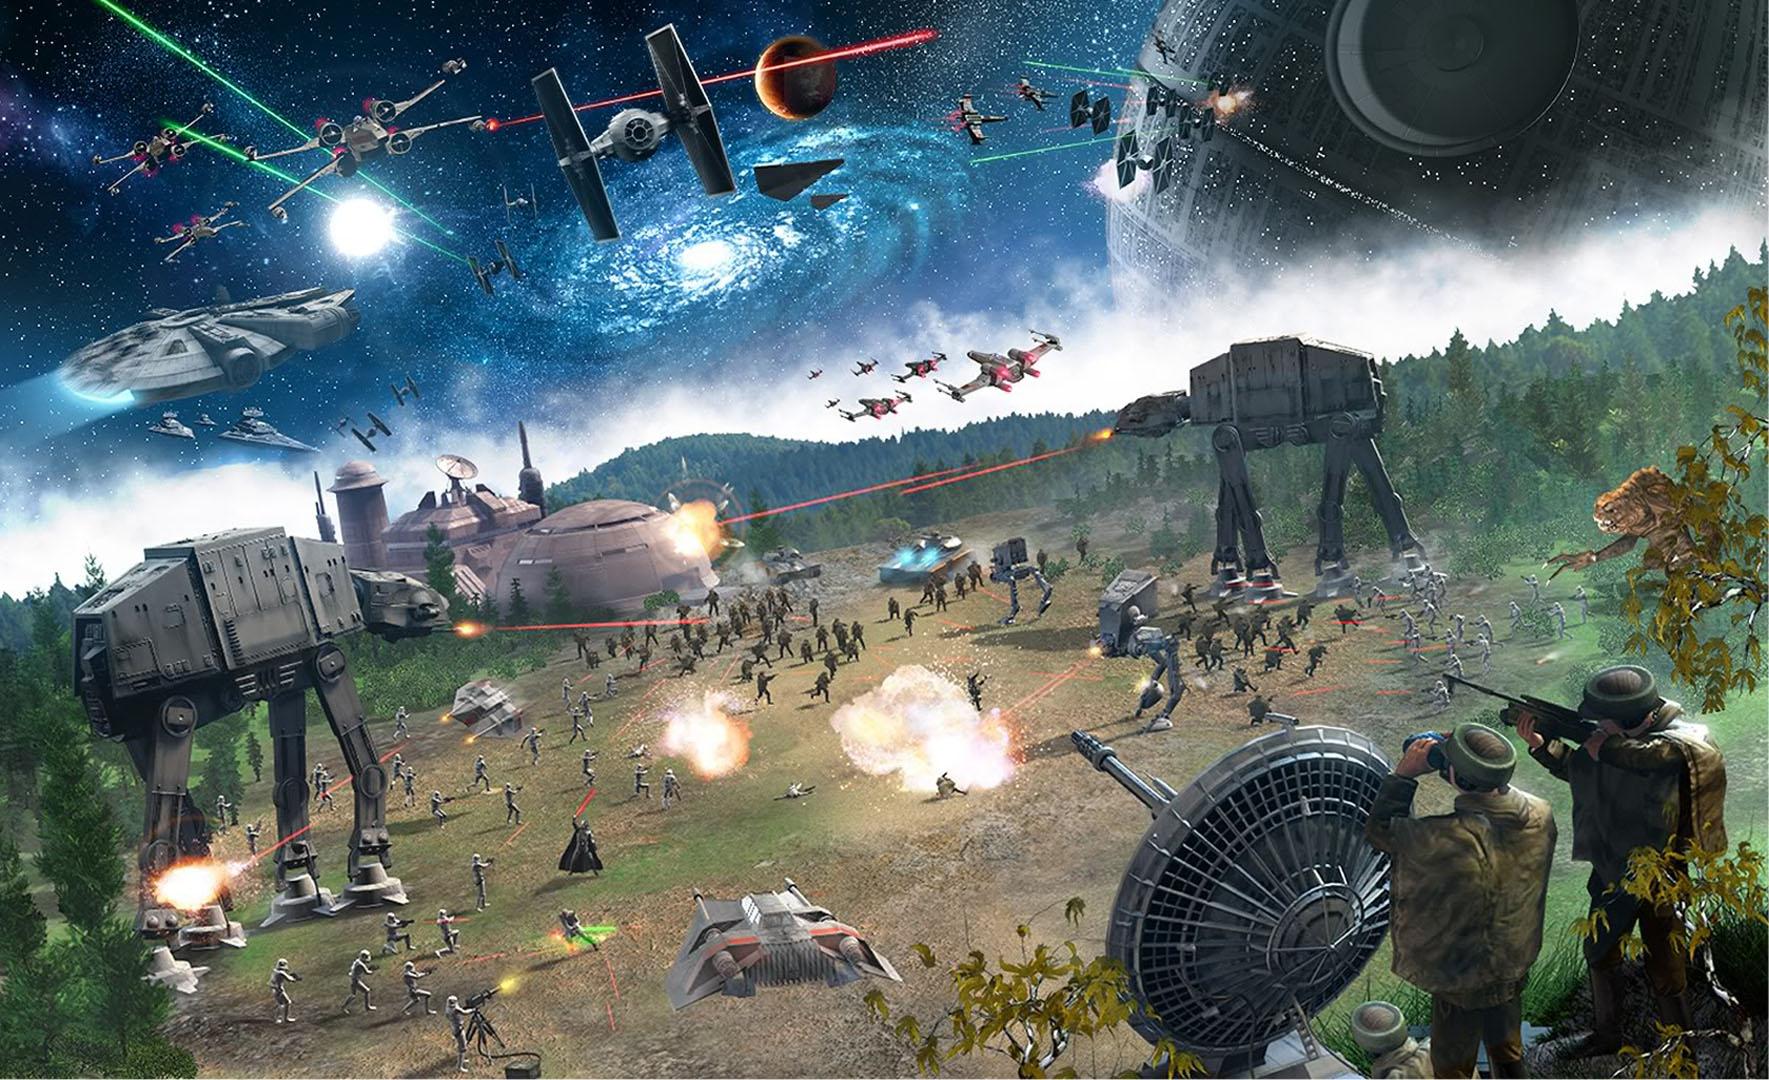 Star Wars Rebel Wallpaper Star wars massive battle 1769x1080